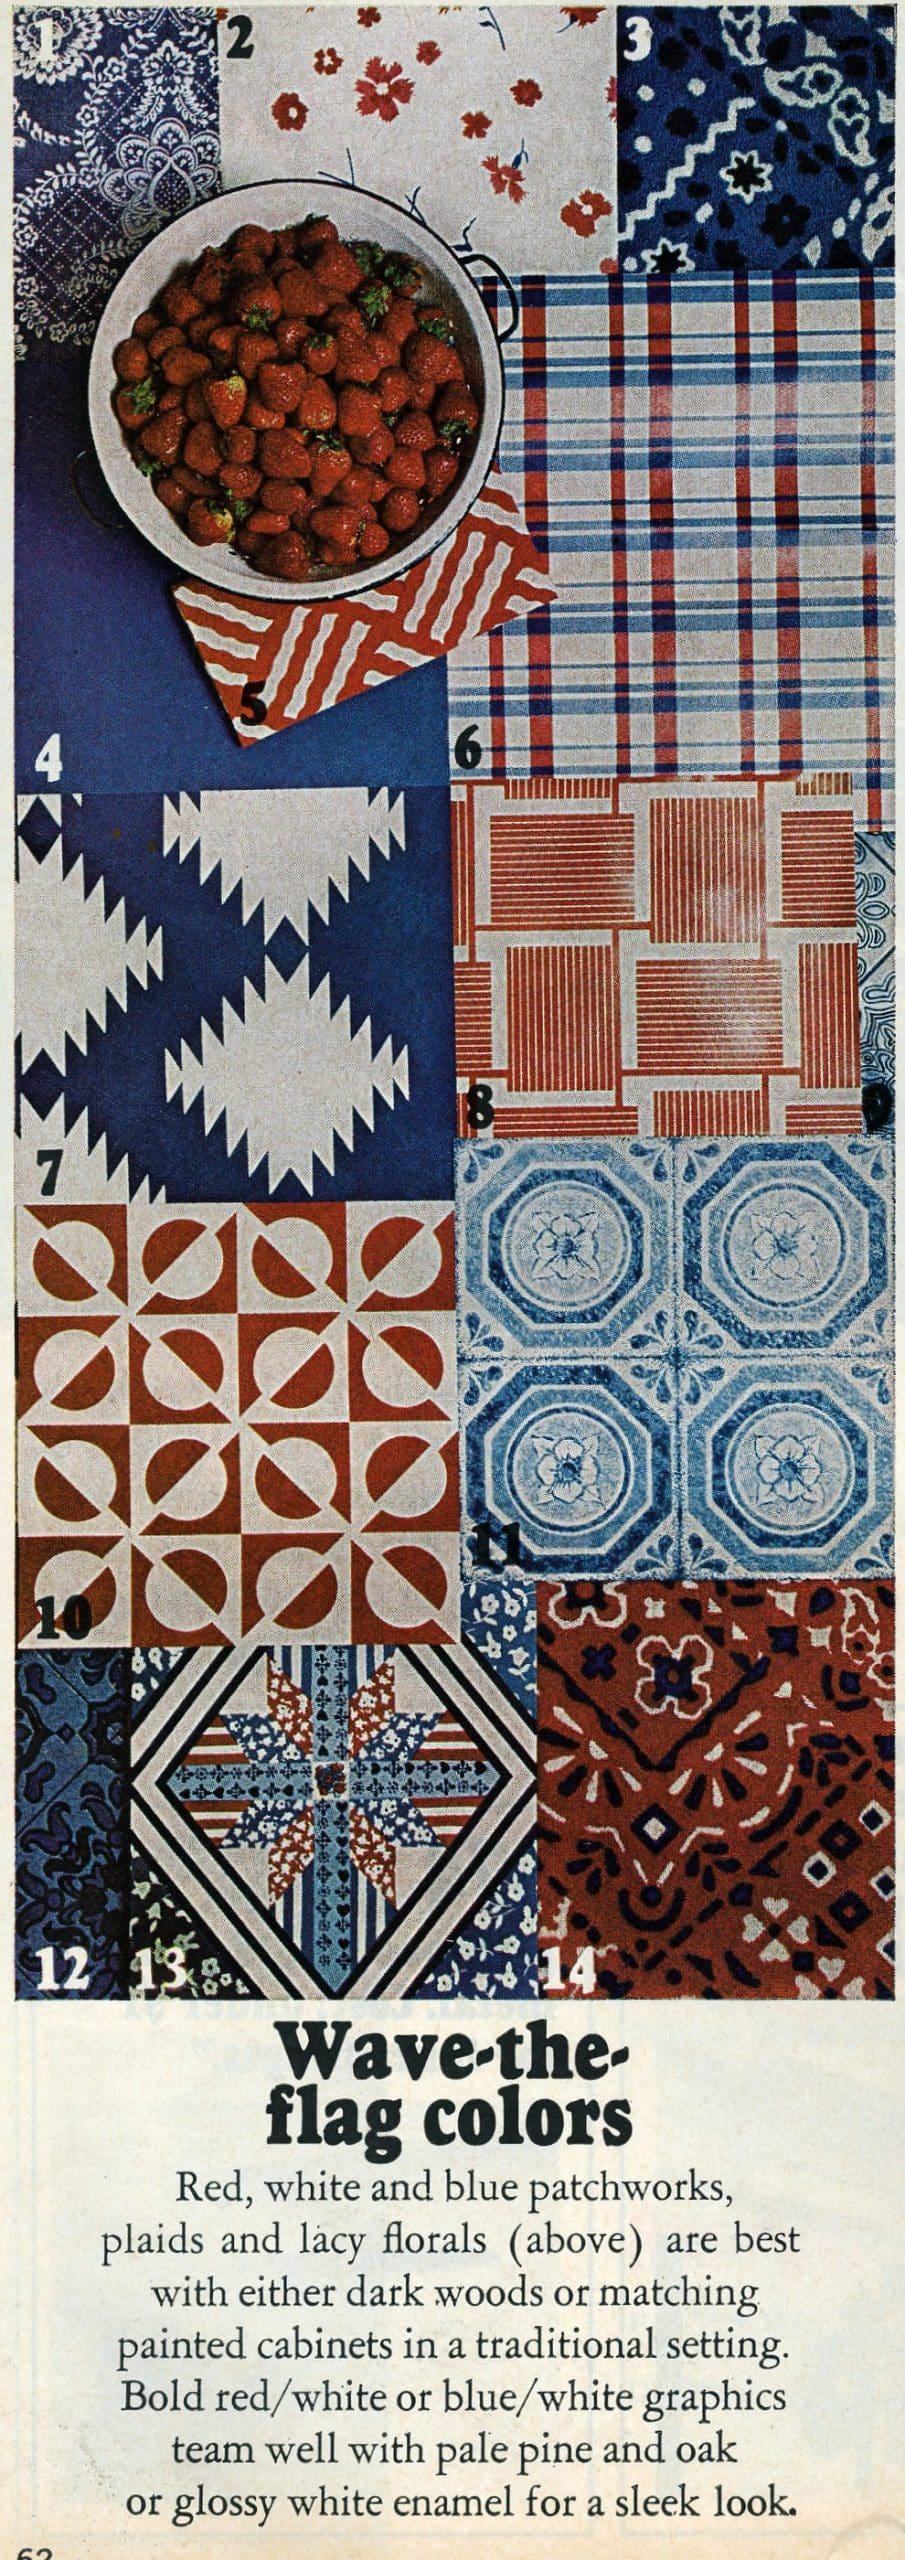 Vintage 1970s kitchen decor colors and patterns - Wave-the-flag colors